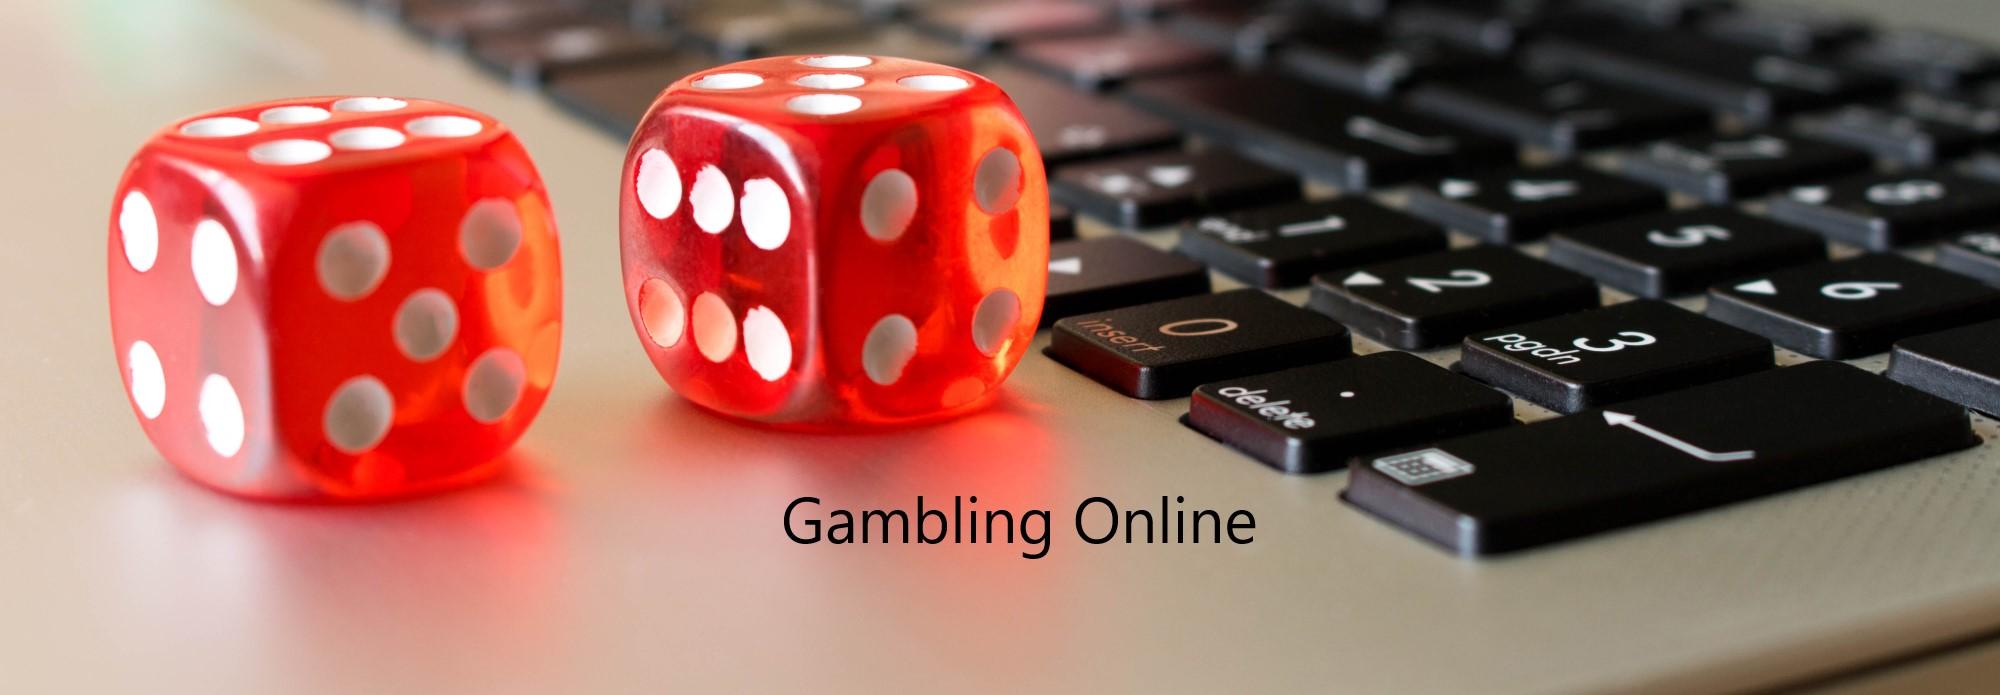 Gambling Online - CasinoGrades